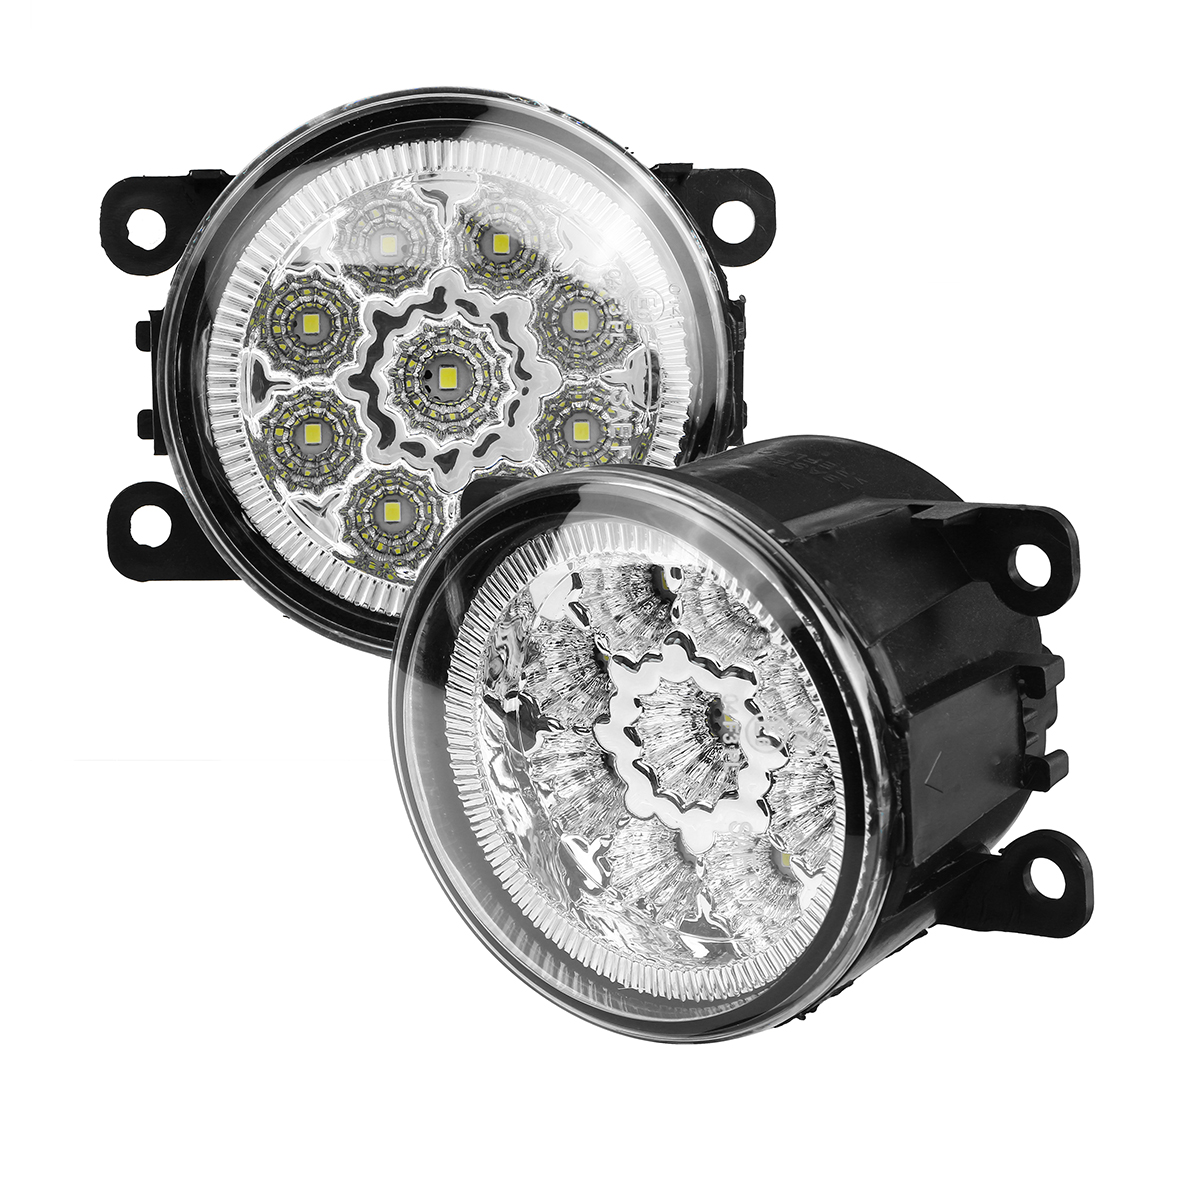 2pcs LED Nebel Licht Nebel Lampe für FORD focus 2 focus 3 TRANSIT TOURNEO TRANSIT CUSTOM FOKUS MK2/3 Mitsubishi Grandis Honda Subaru